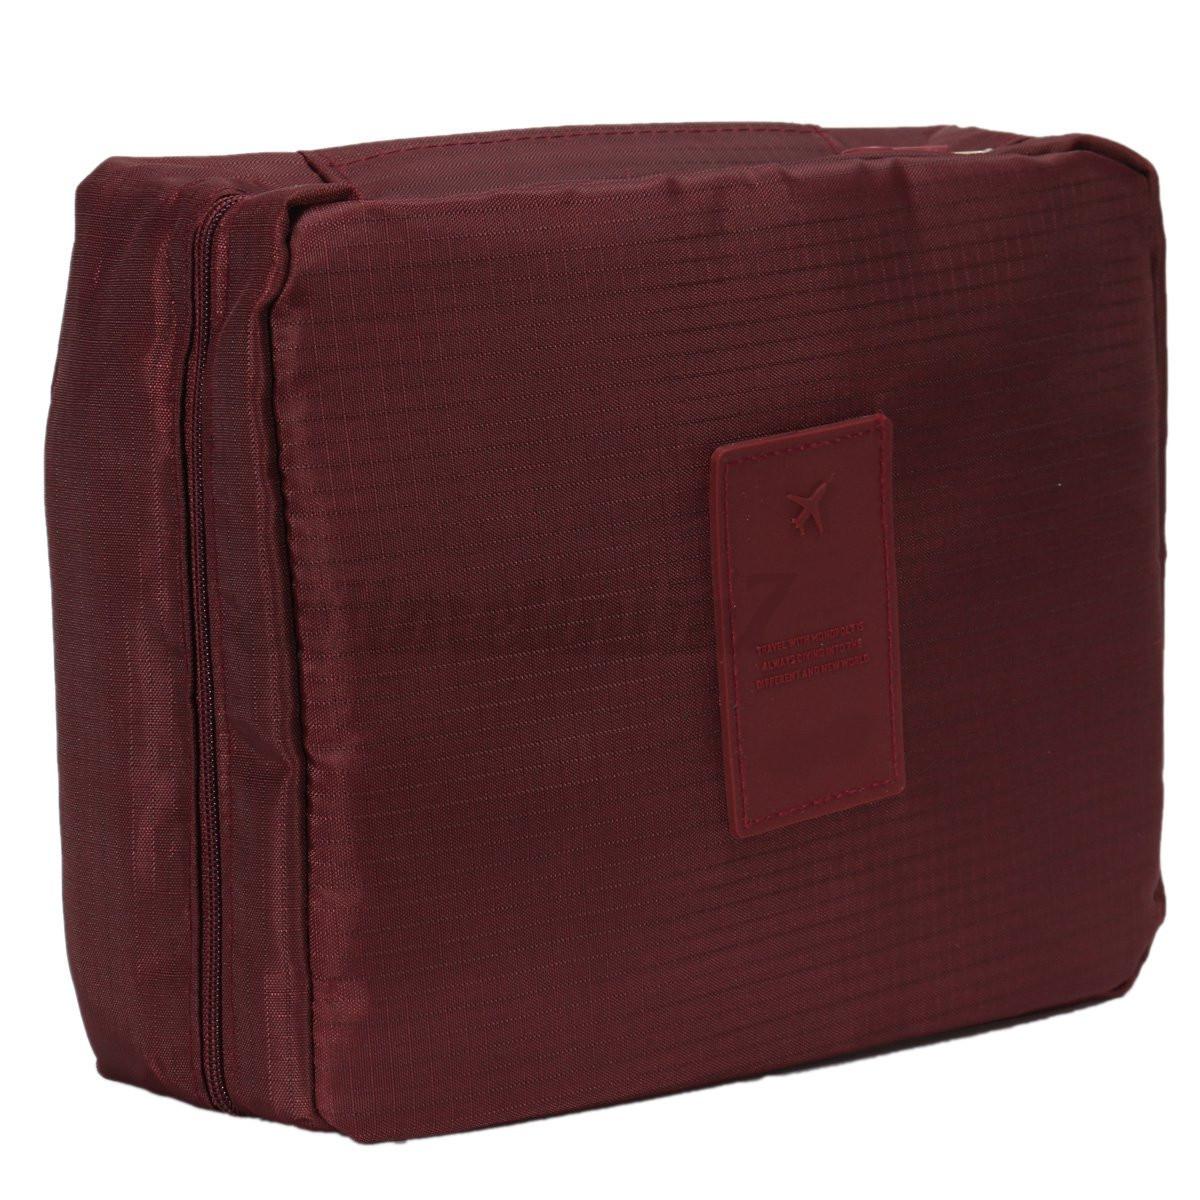 UK Girl Wash Bag Toiletry Cosmetic Travel Make Up Hanging Folding Case Organizer